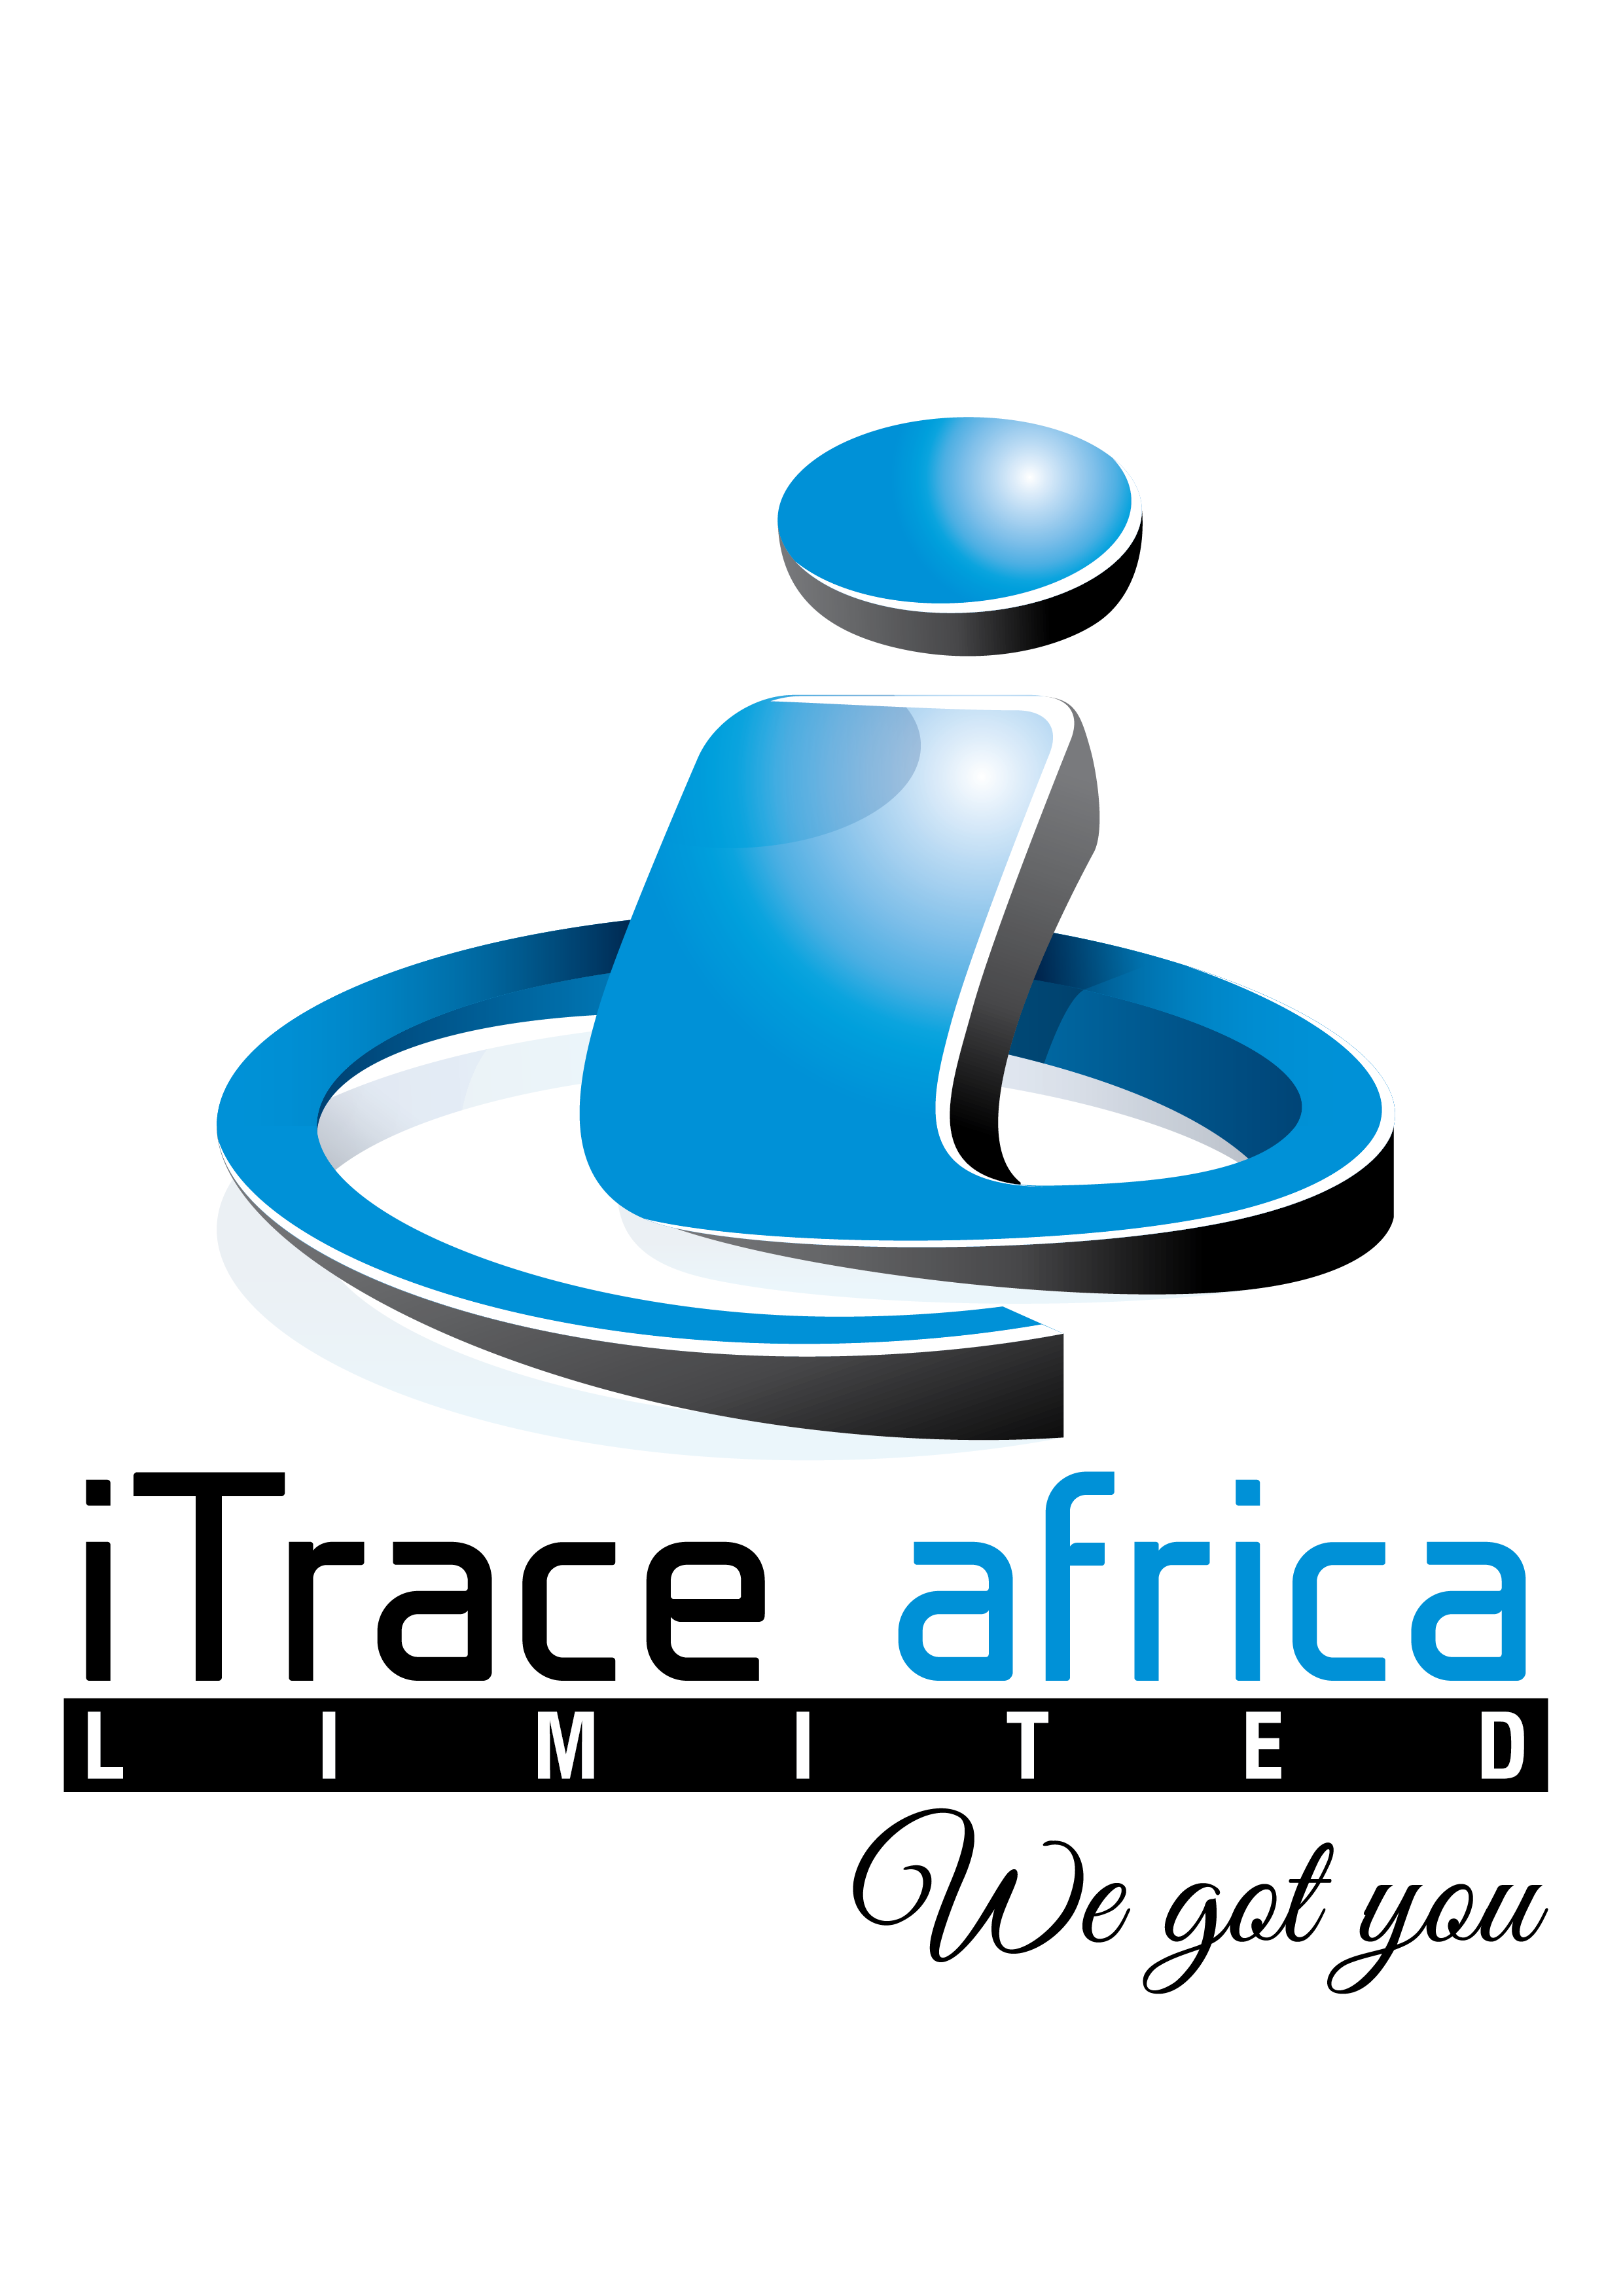 Contact us for Car alarms in Kenya, Autowatch alarms, car